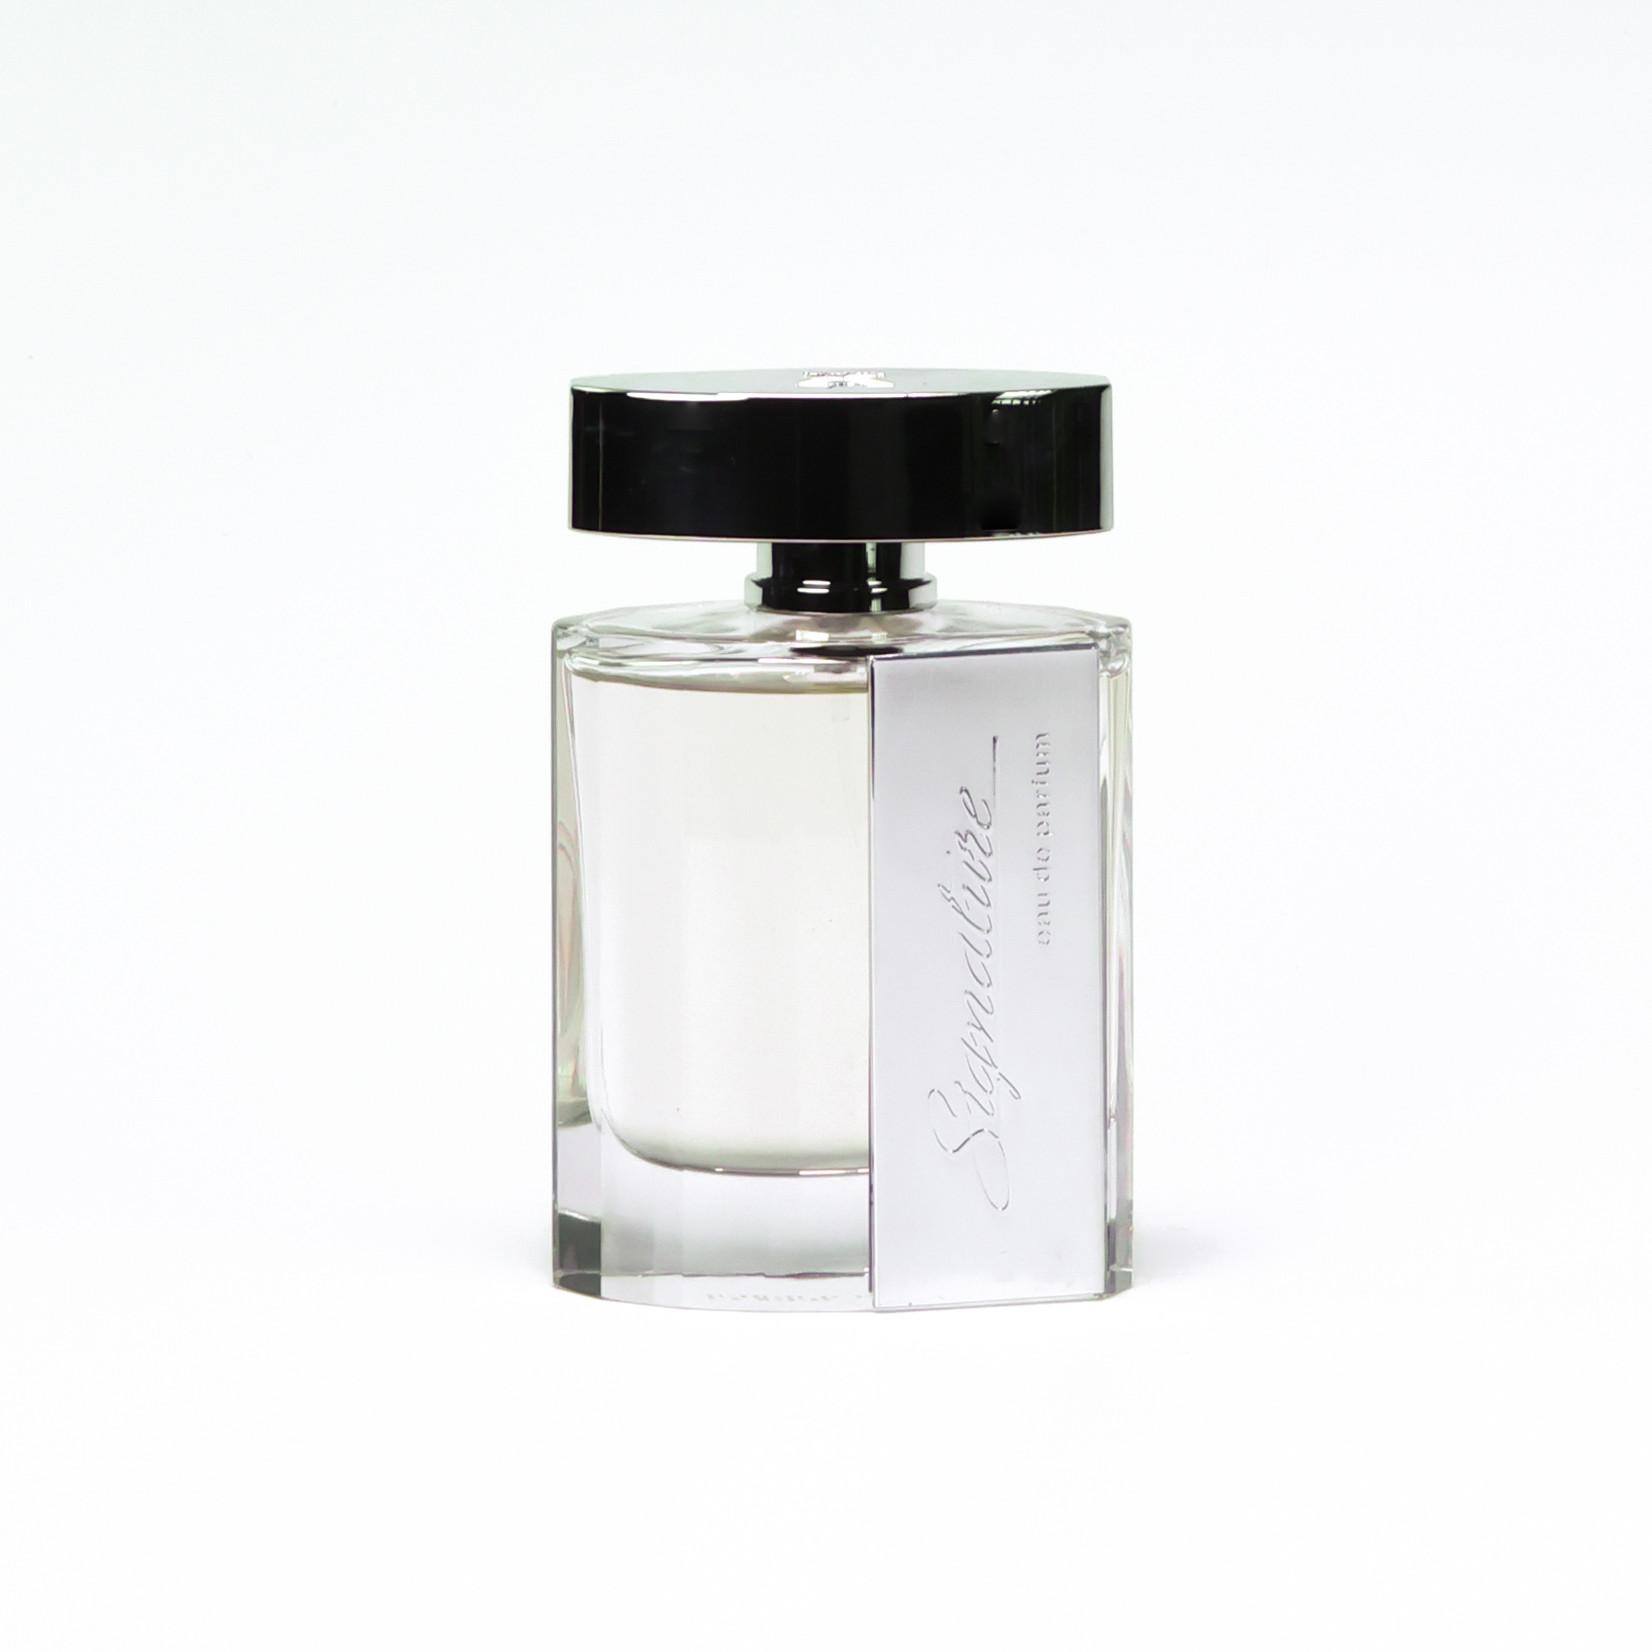 Arabian Oud Signature (90 ml Eau de Parfum)